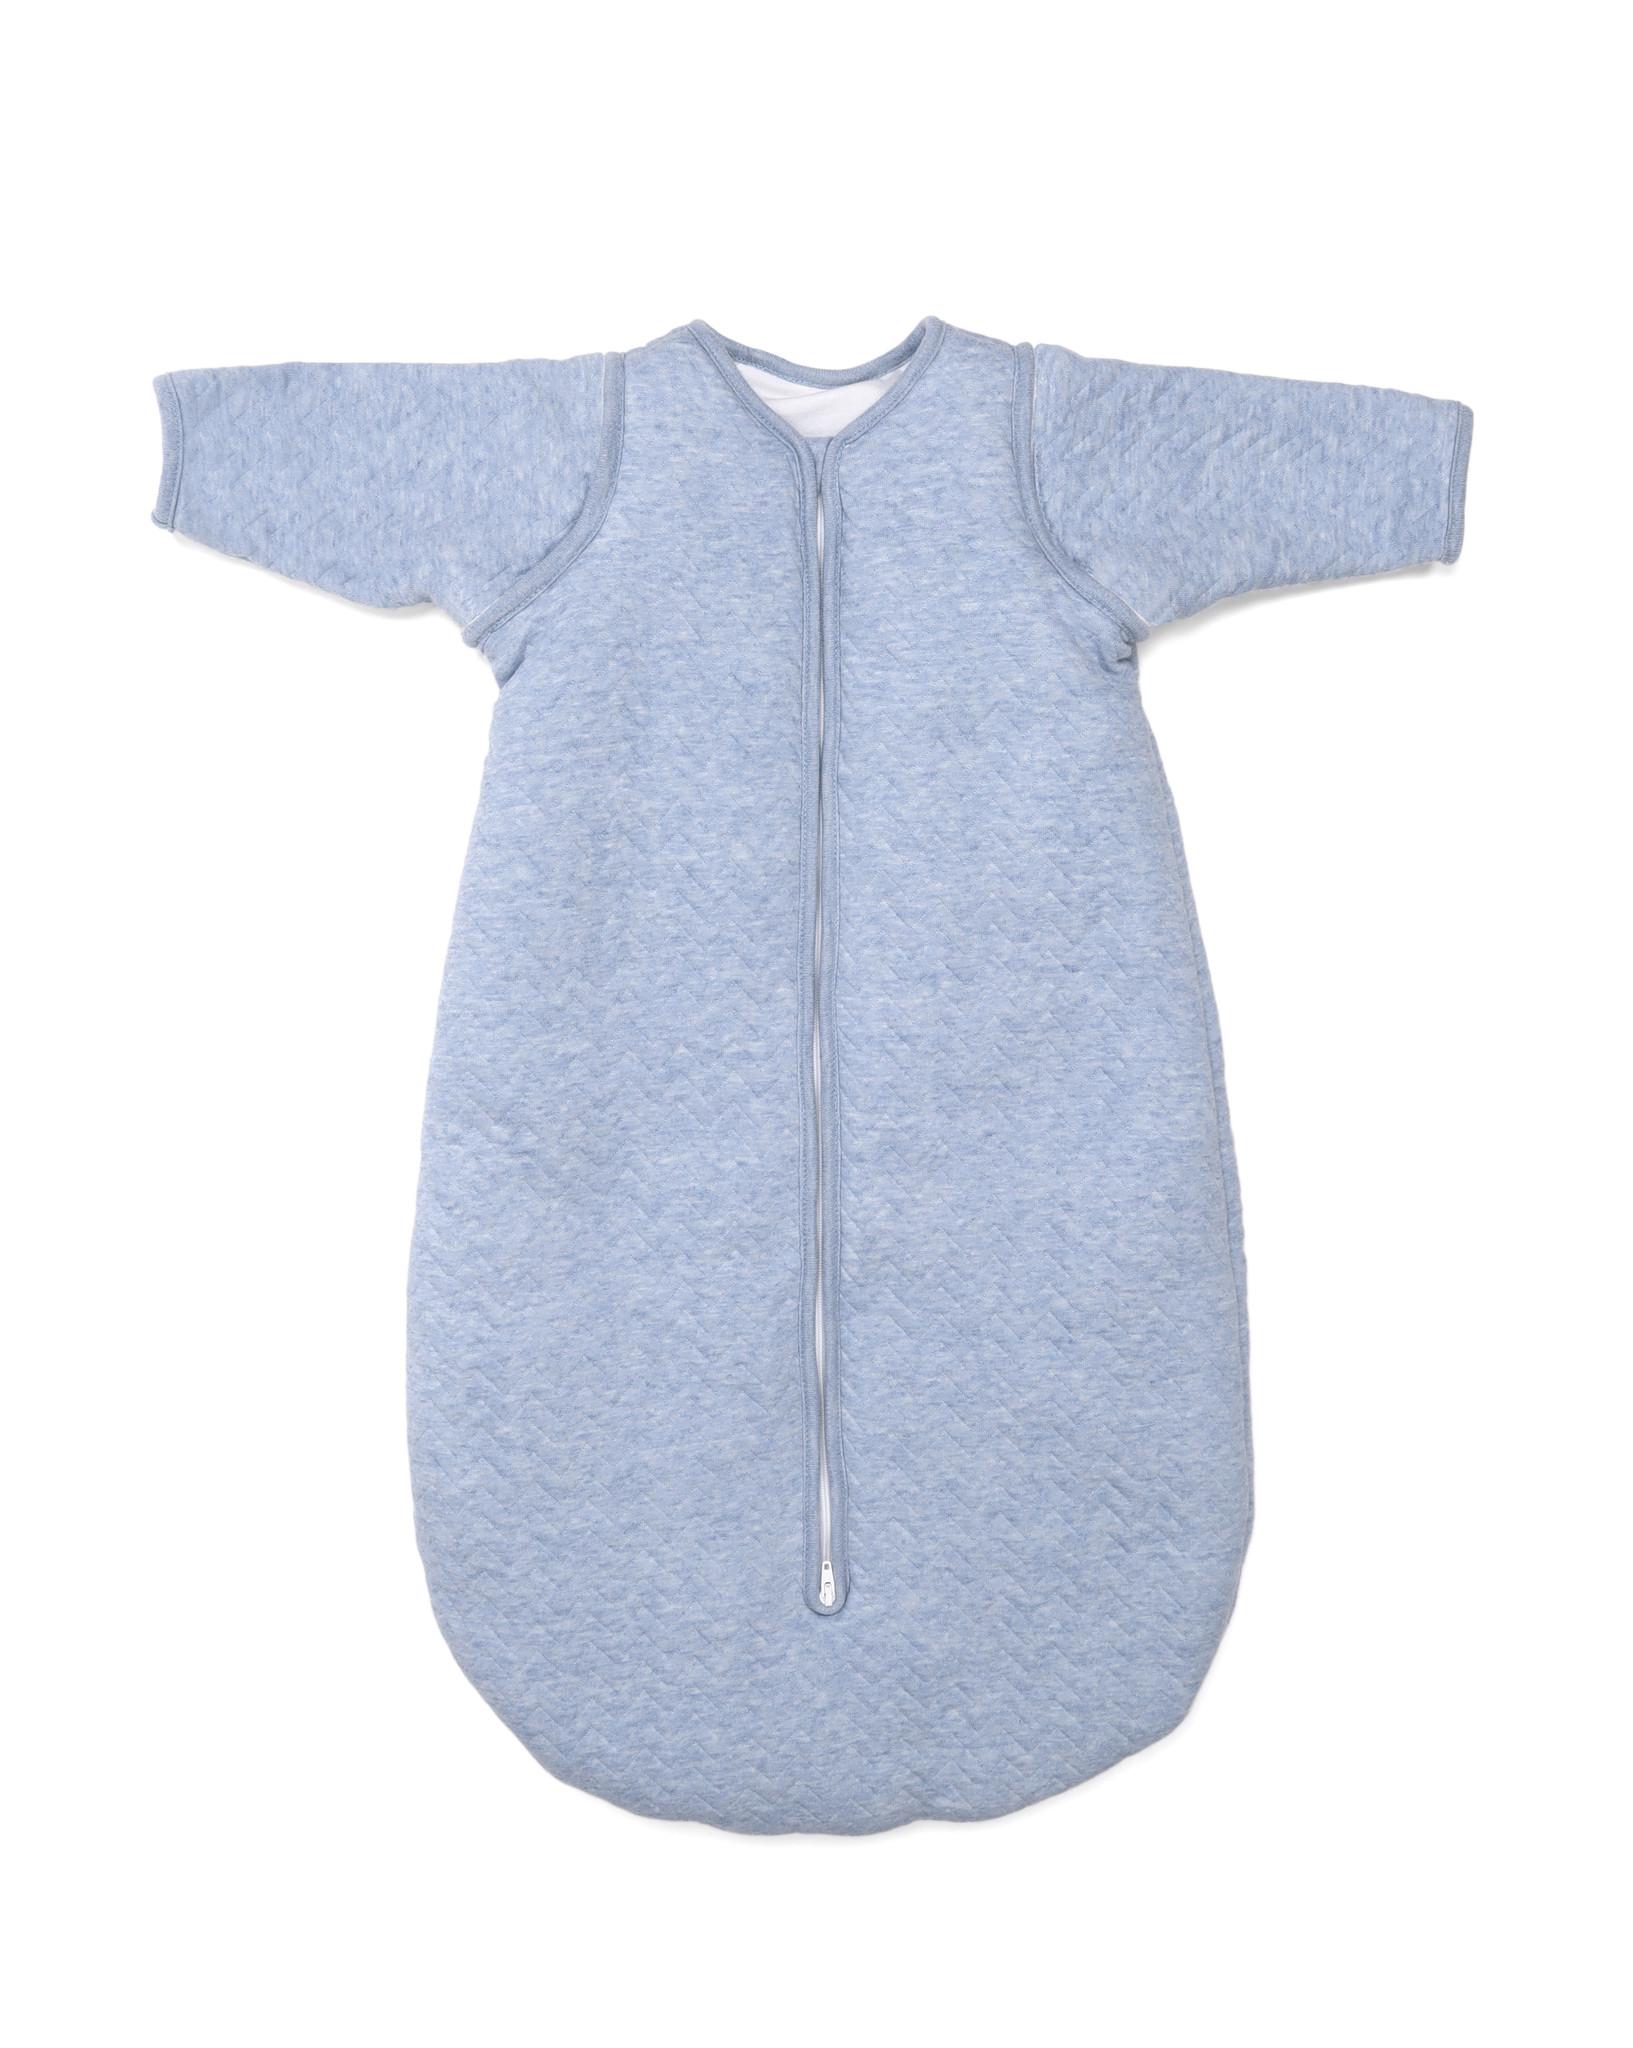 Jersey slaapzak 90cm met afritsbare mouwen Chevron Denim Blue-6